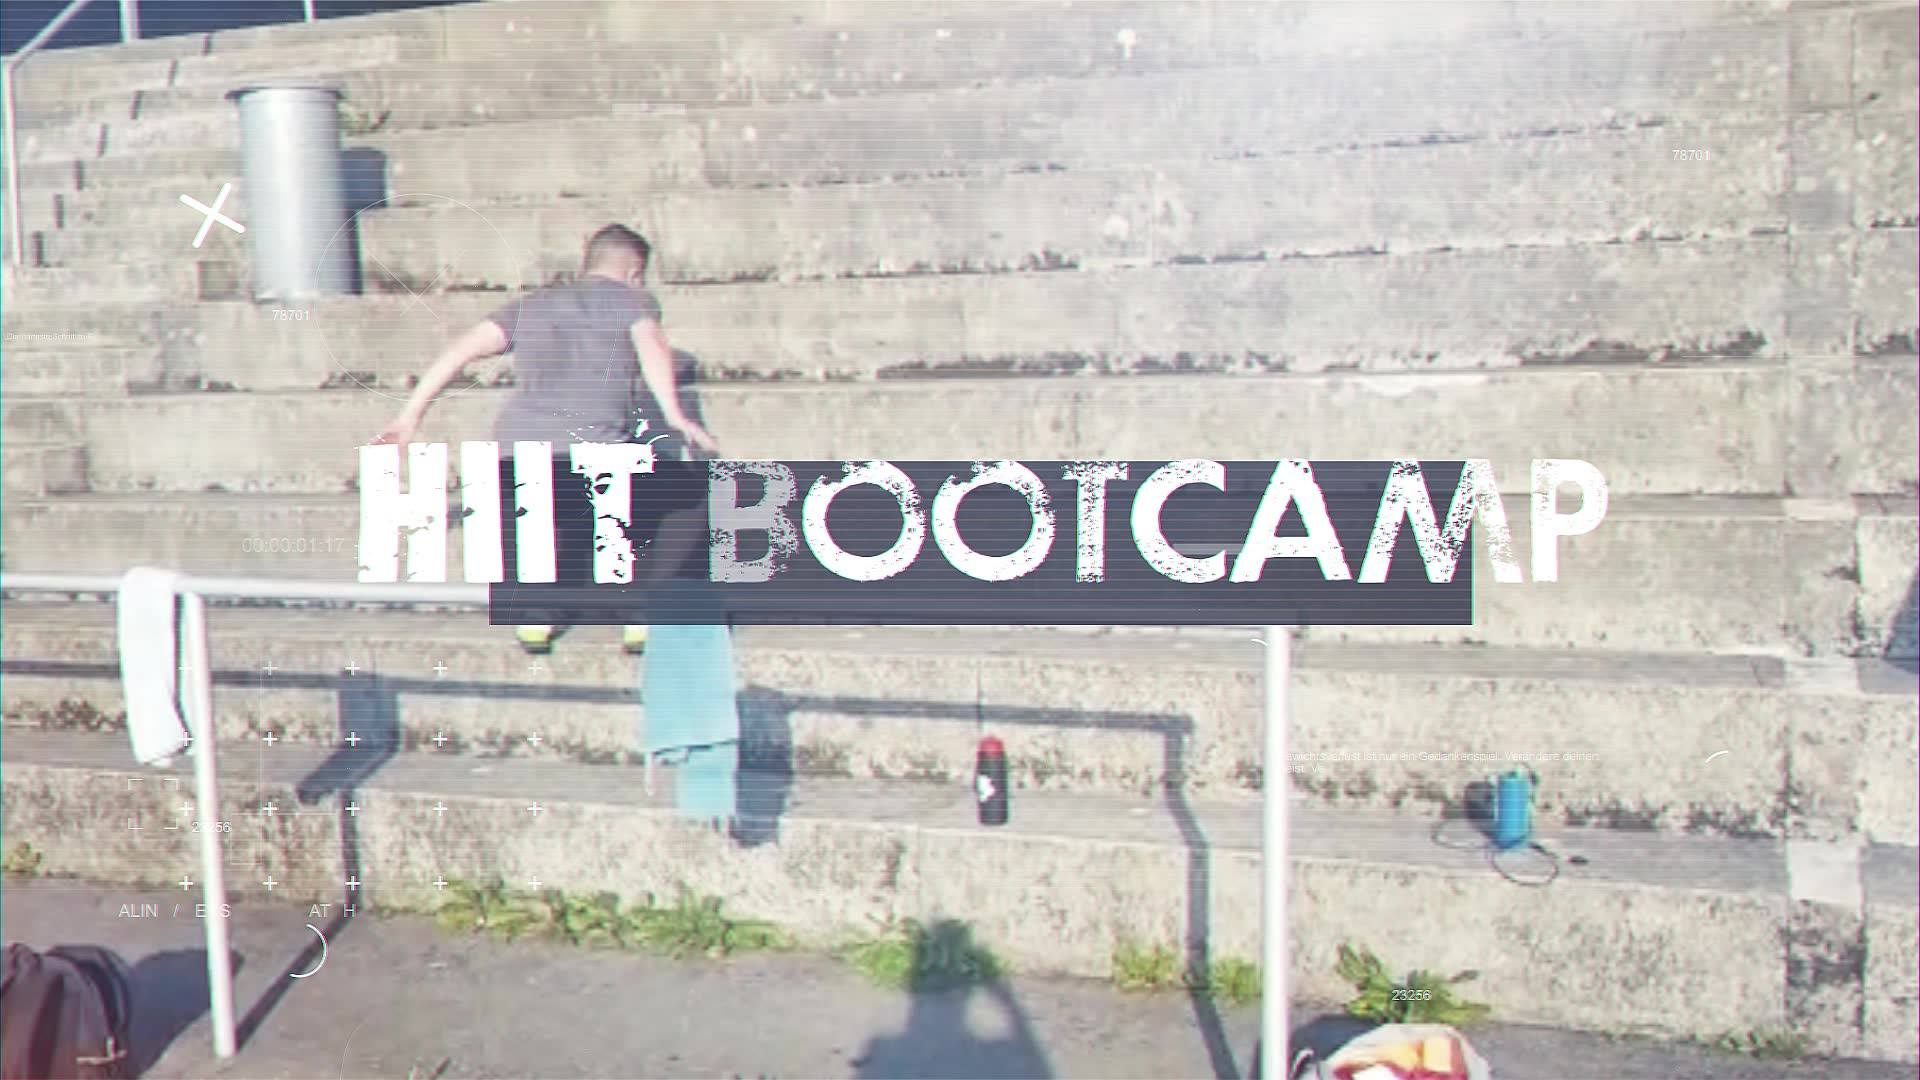 TRAILER OUTDOOR HIIT BOOTCAMP